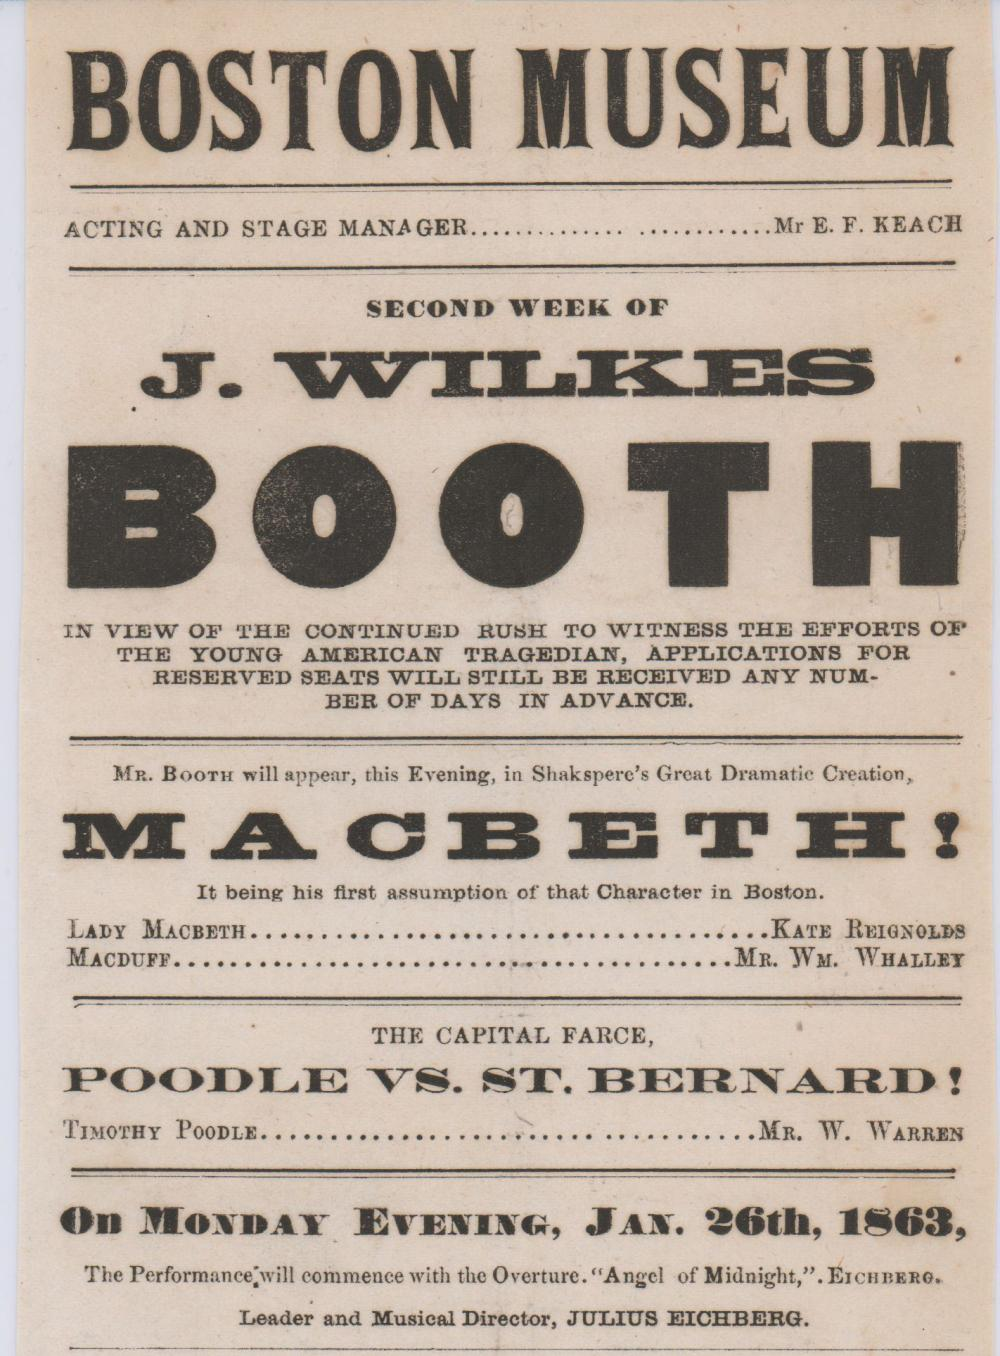 John Wilkes Booth Plays Macbeth at The Boston Museum!